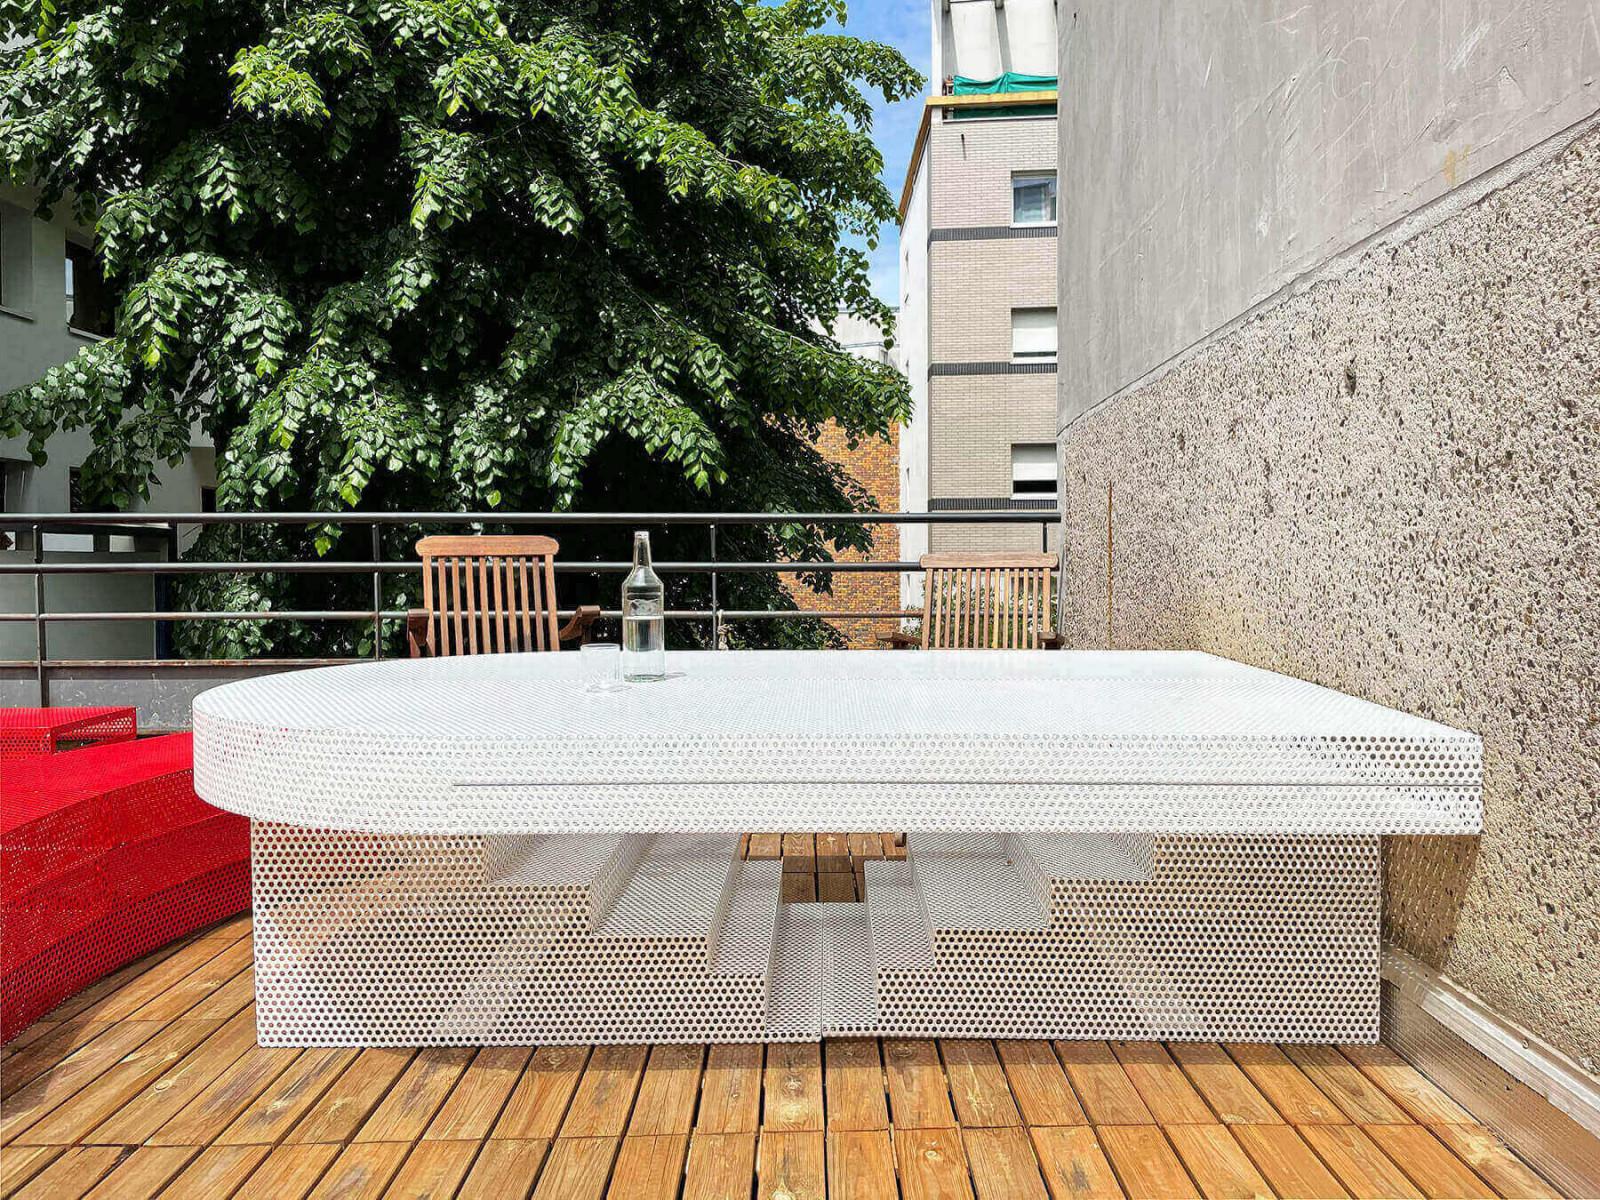 graam-meuble-exterieur-terrasse-agence-rouge-blanc-tole